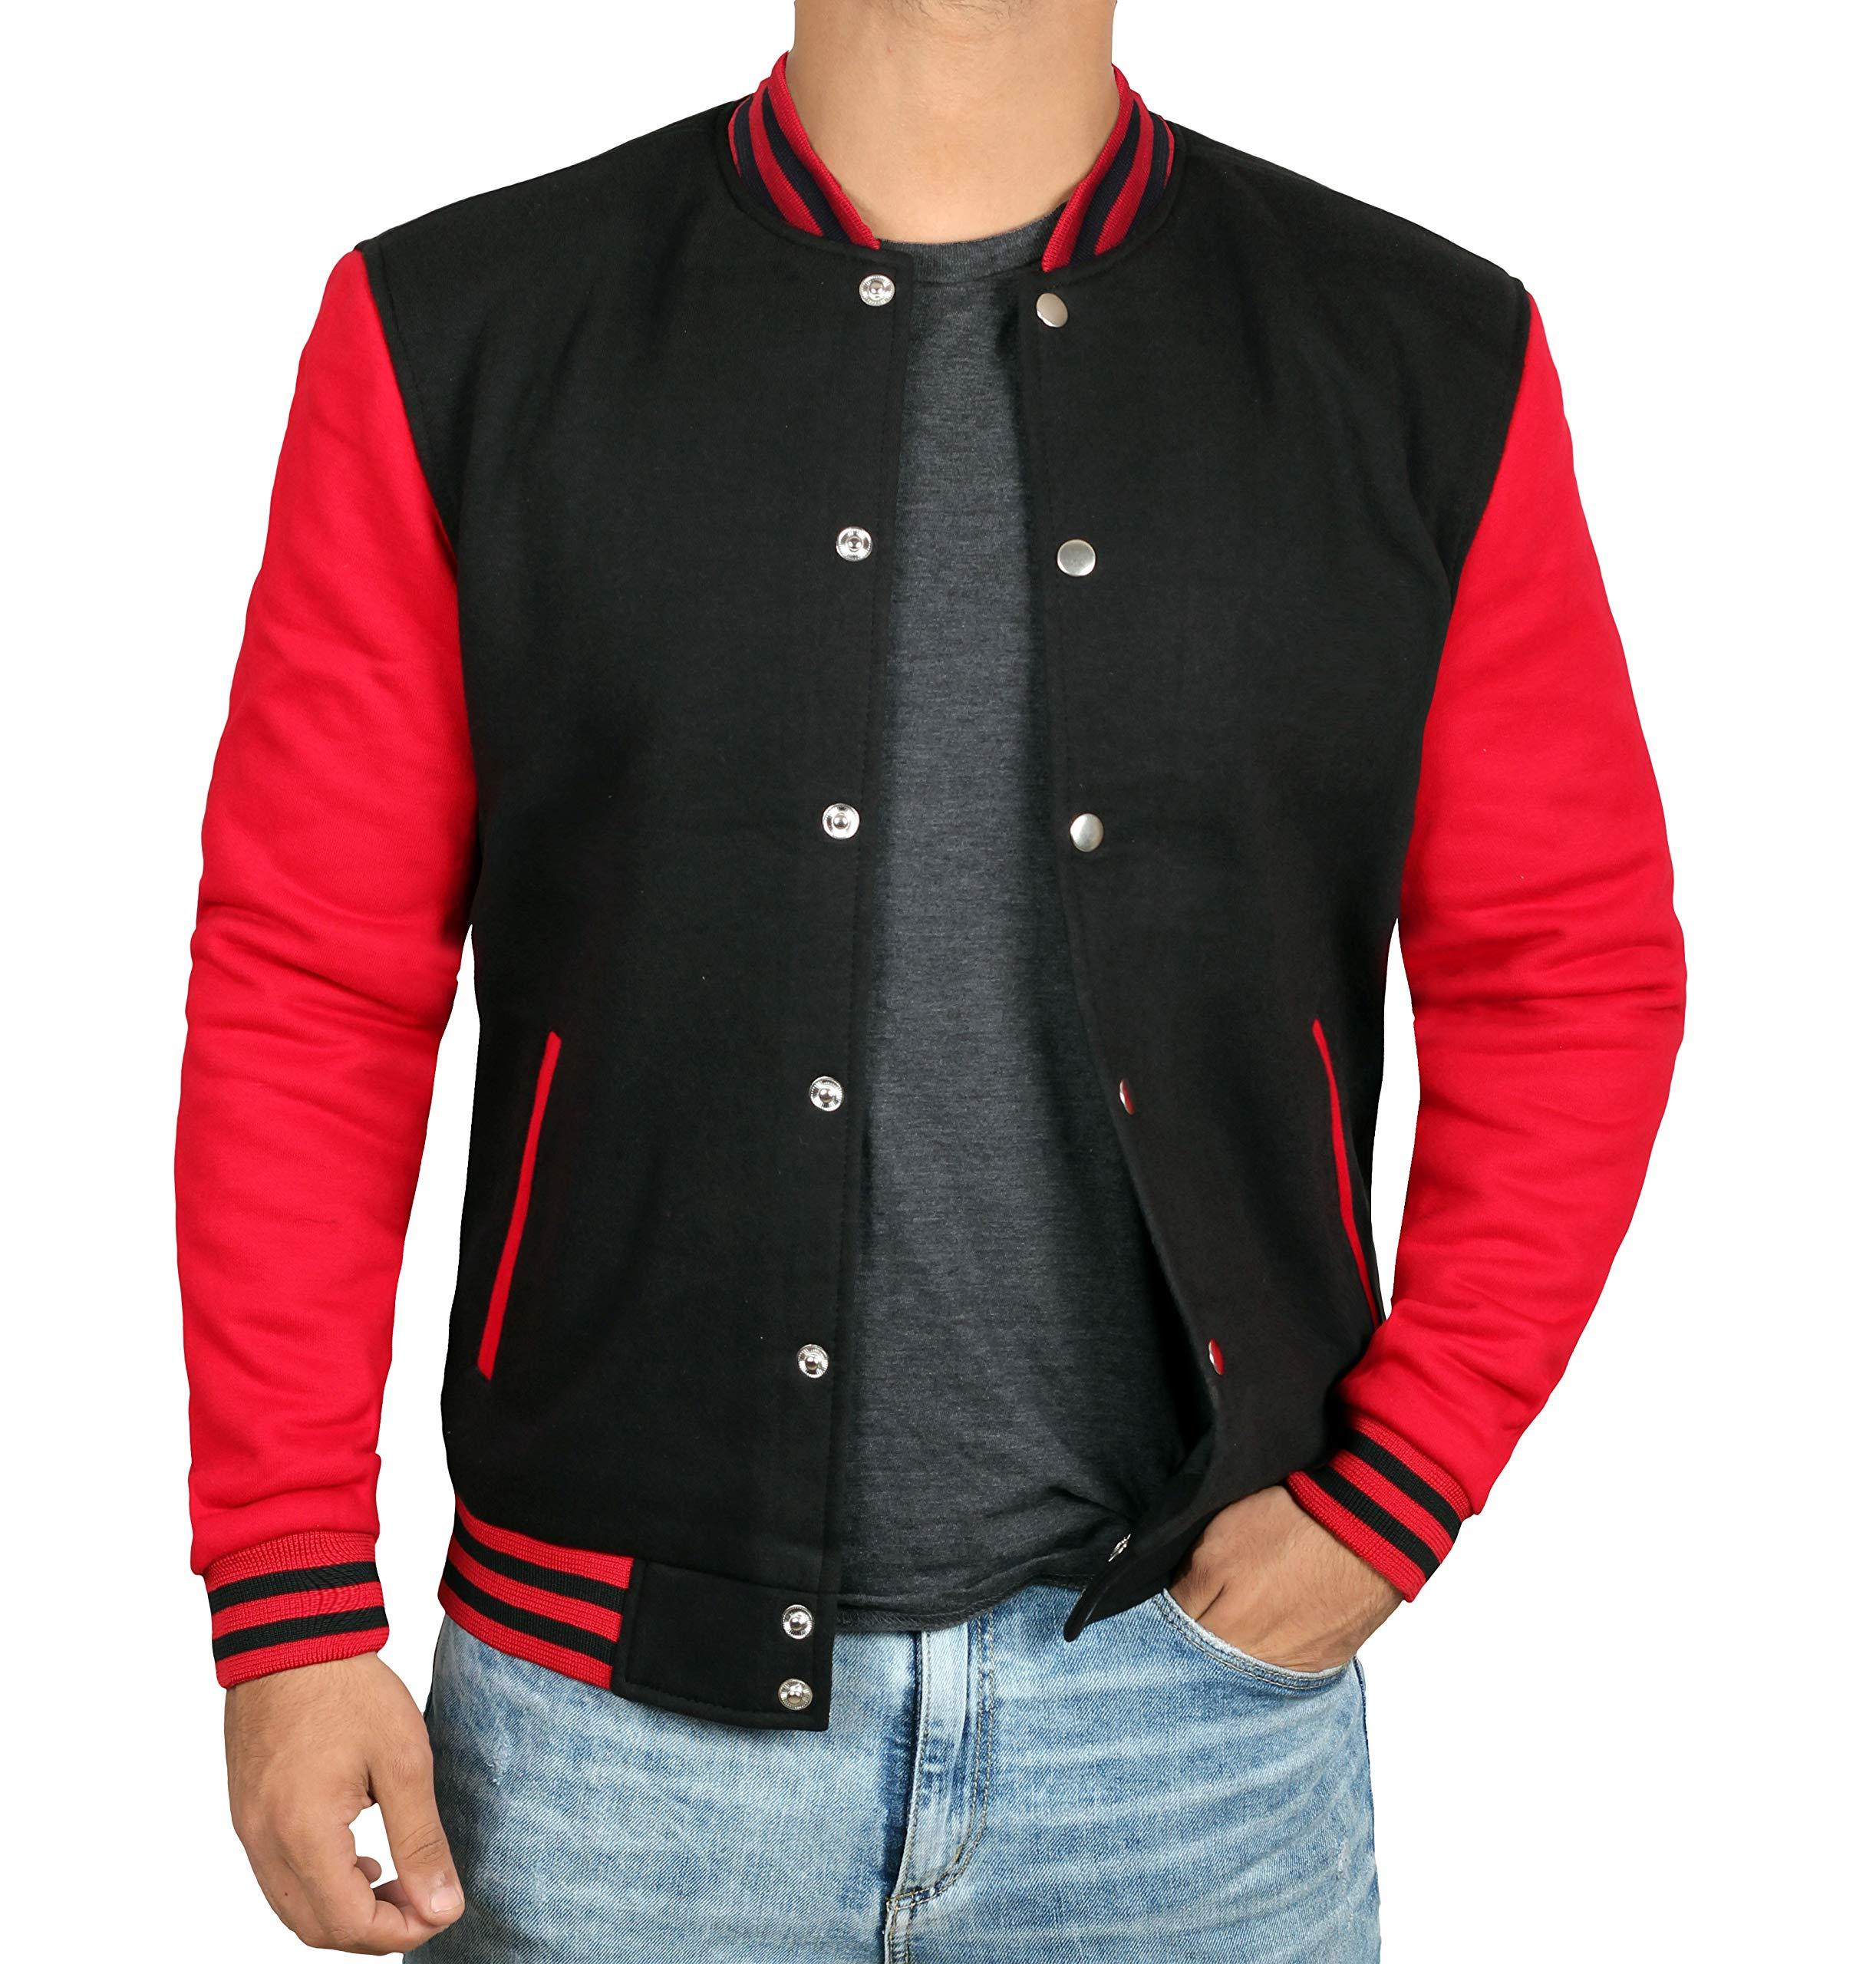 Black and Red Varsity Jacket Men - Baseball Jacket | Plain Red Sleve | M by Decrum